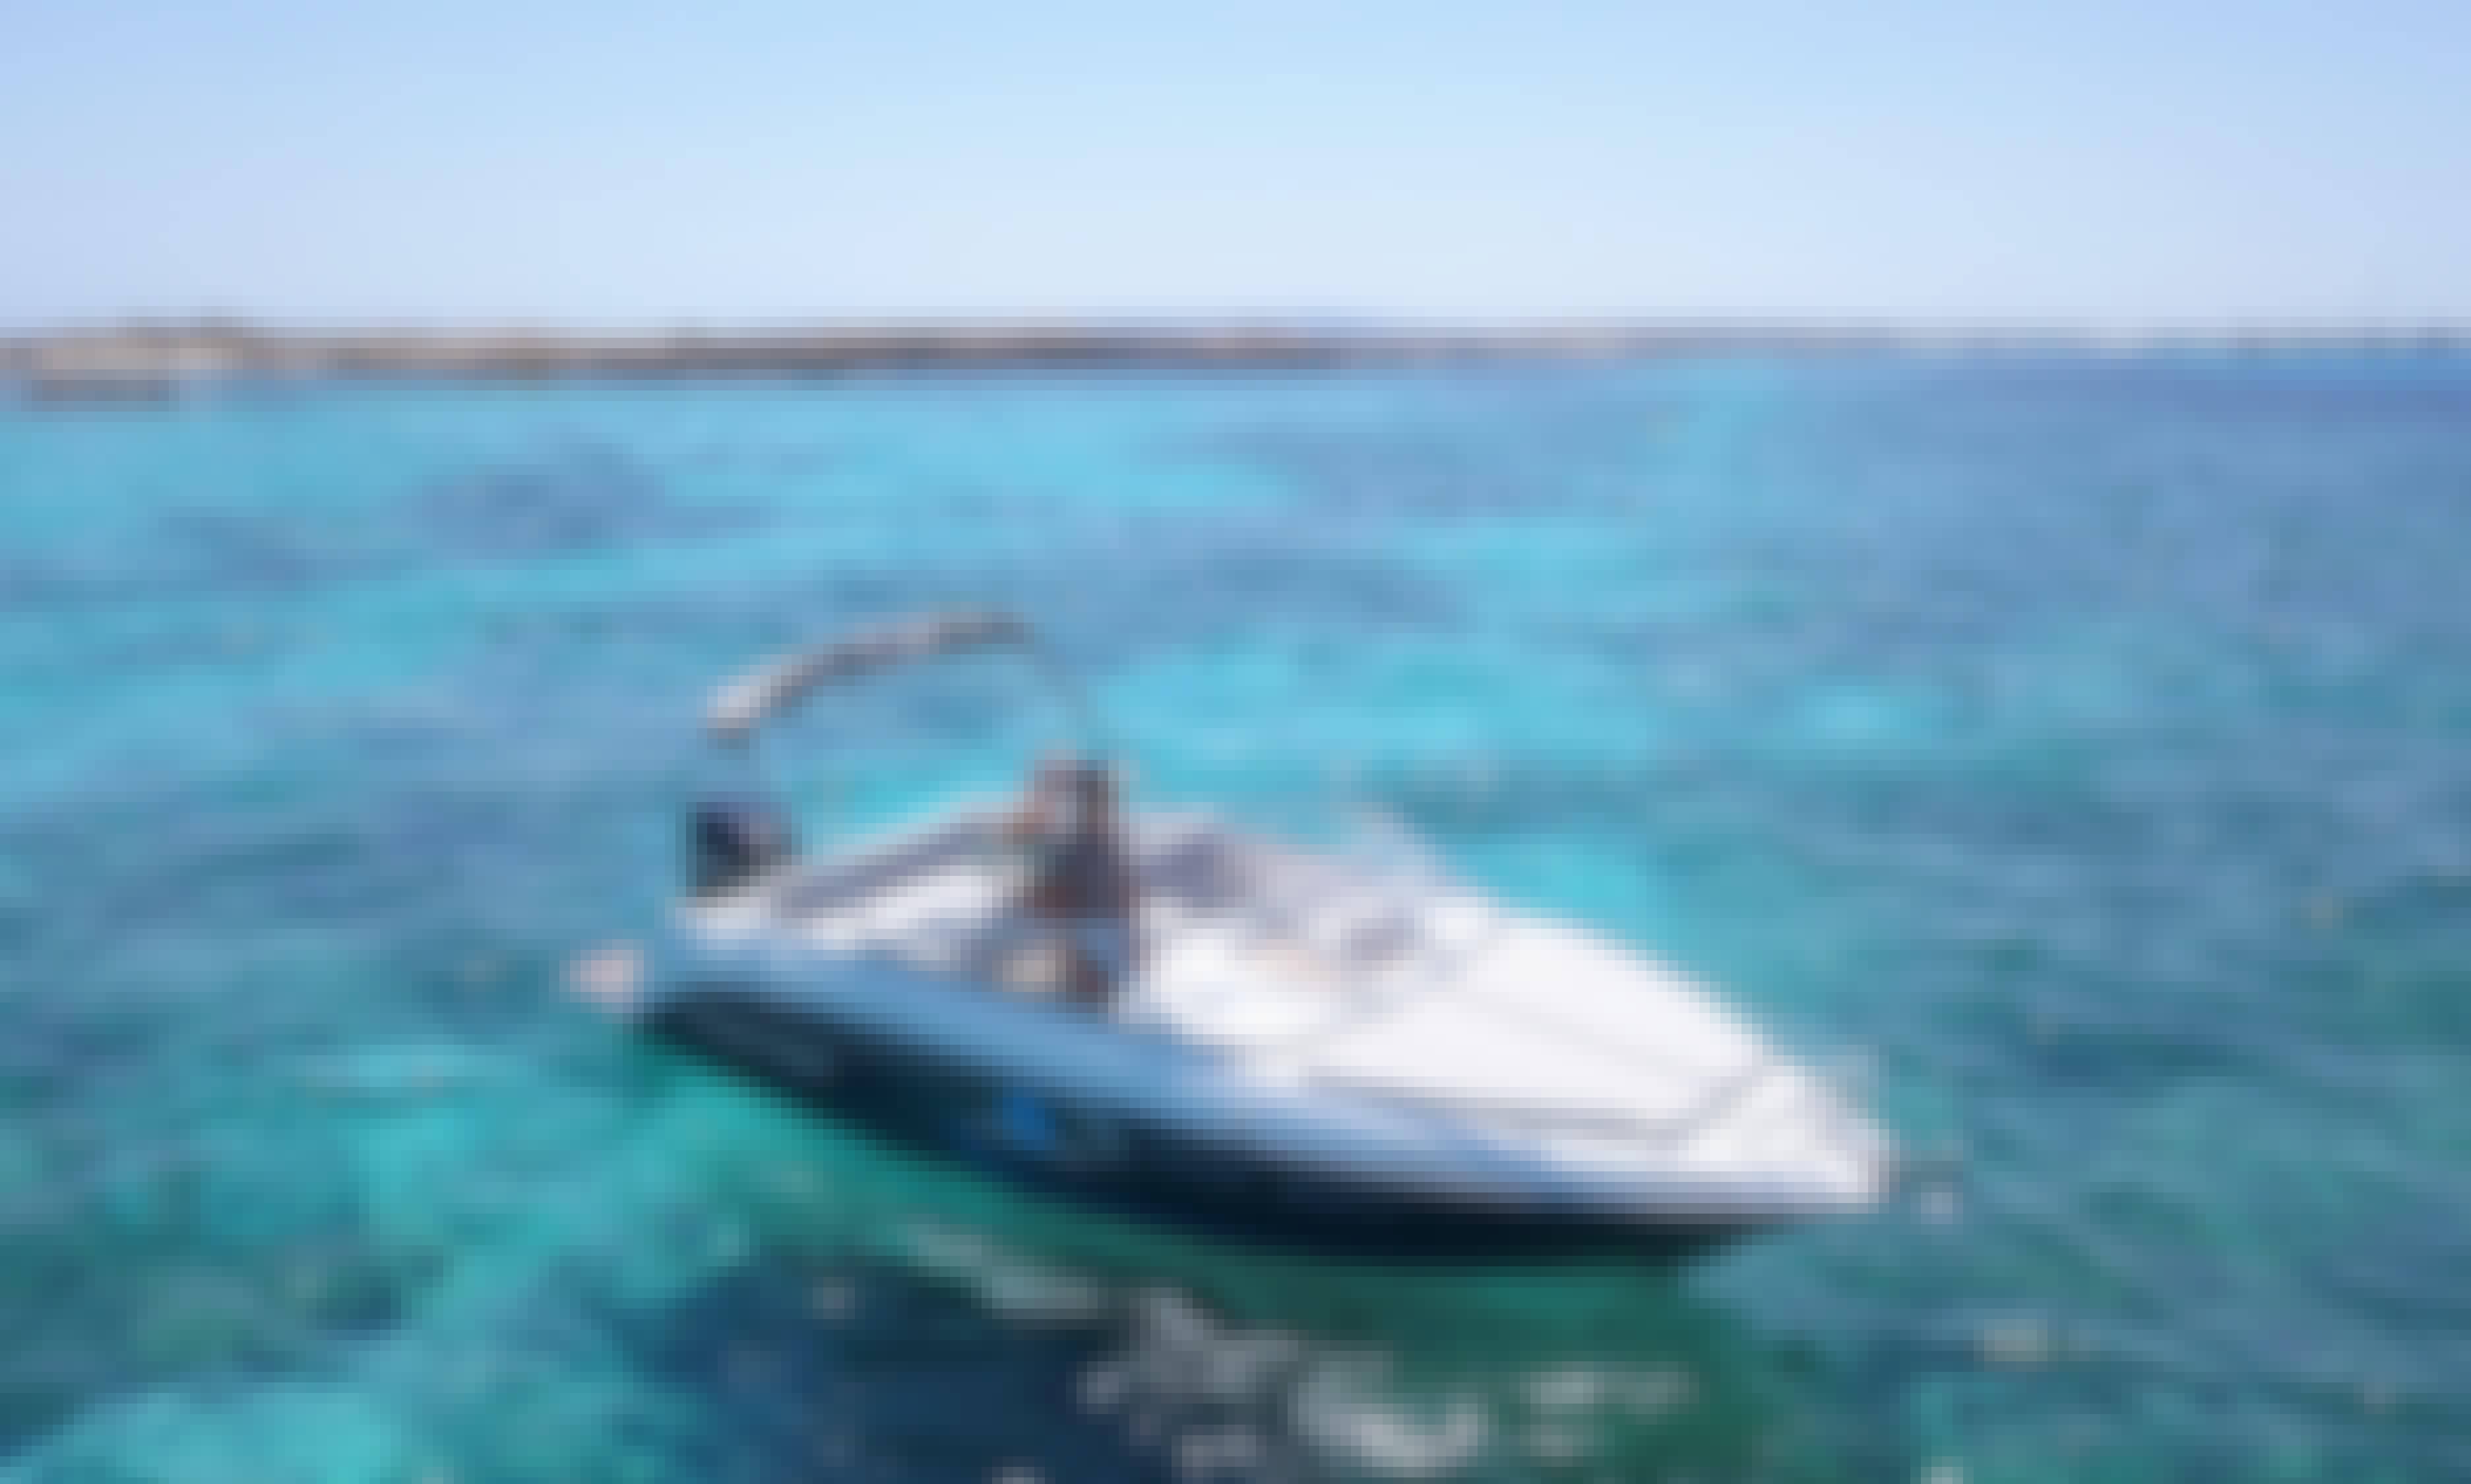 """HENDRIX"" Pacific Craft 700 rental in Eivissa"